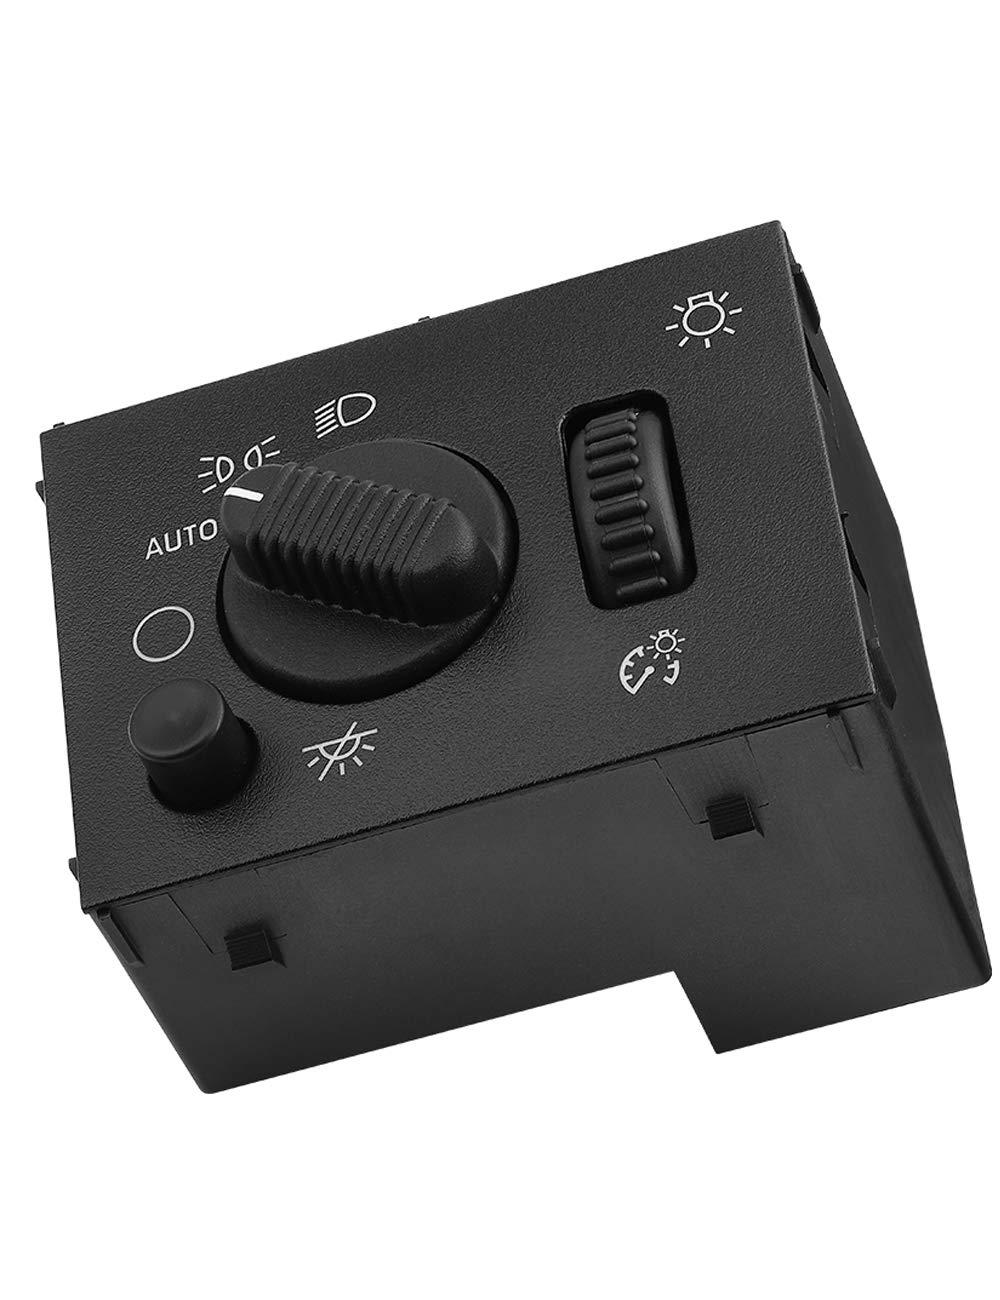 Headlight Switch Compatible with Silverado JoyTutus Sierra 2003 2004 2005 2006 2007 19381535 D1595G 15194803 Headlamp Dimmer Switch